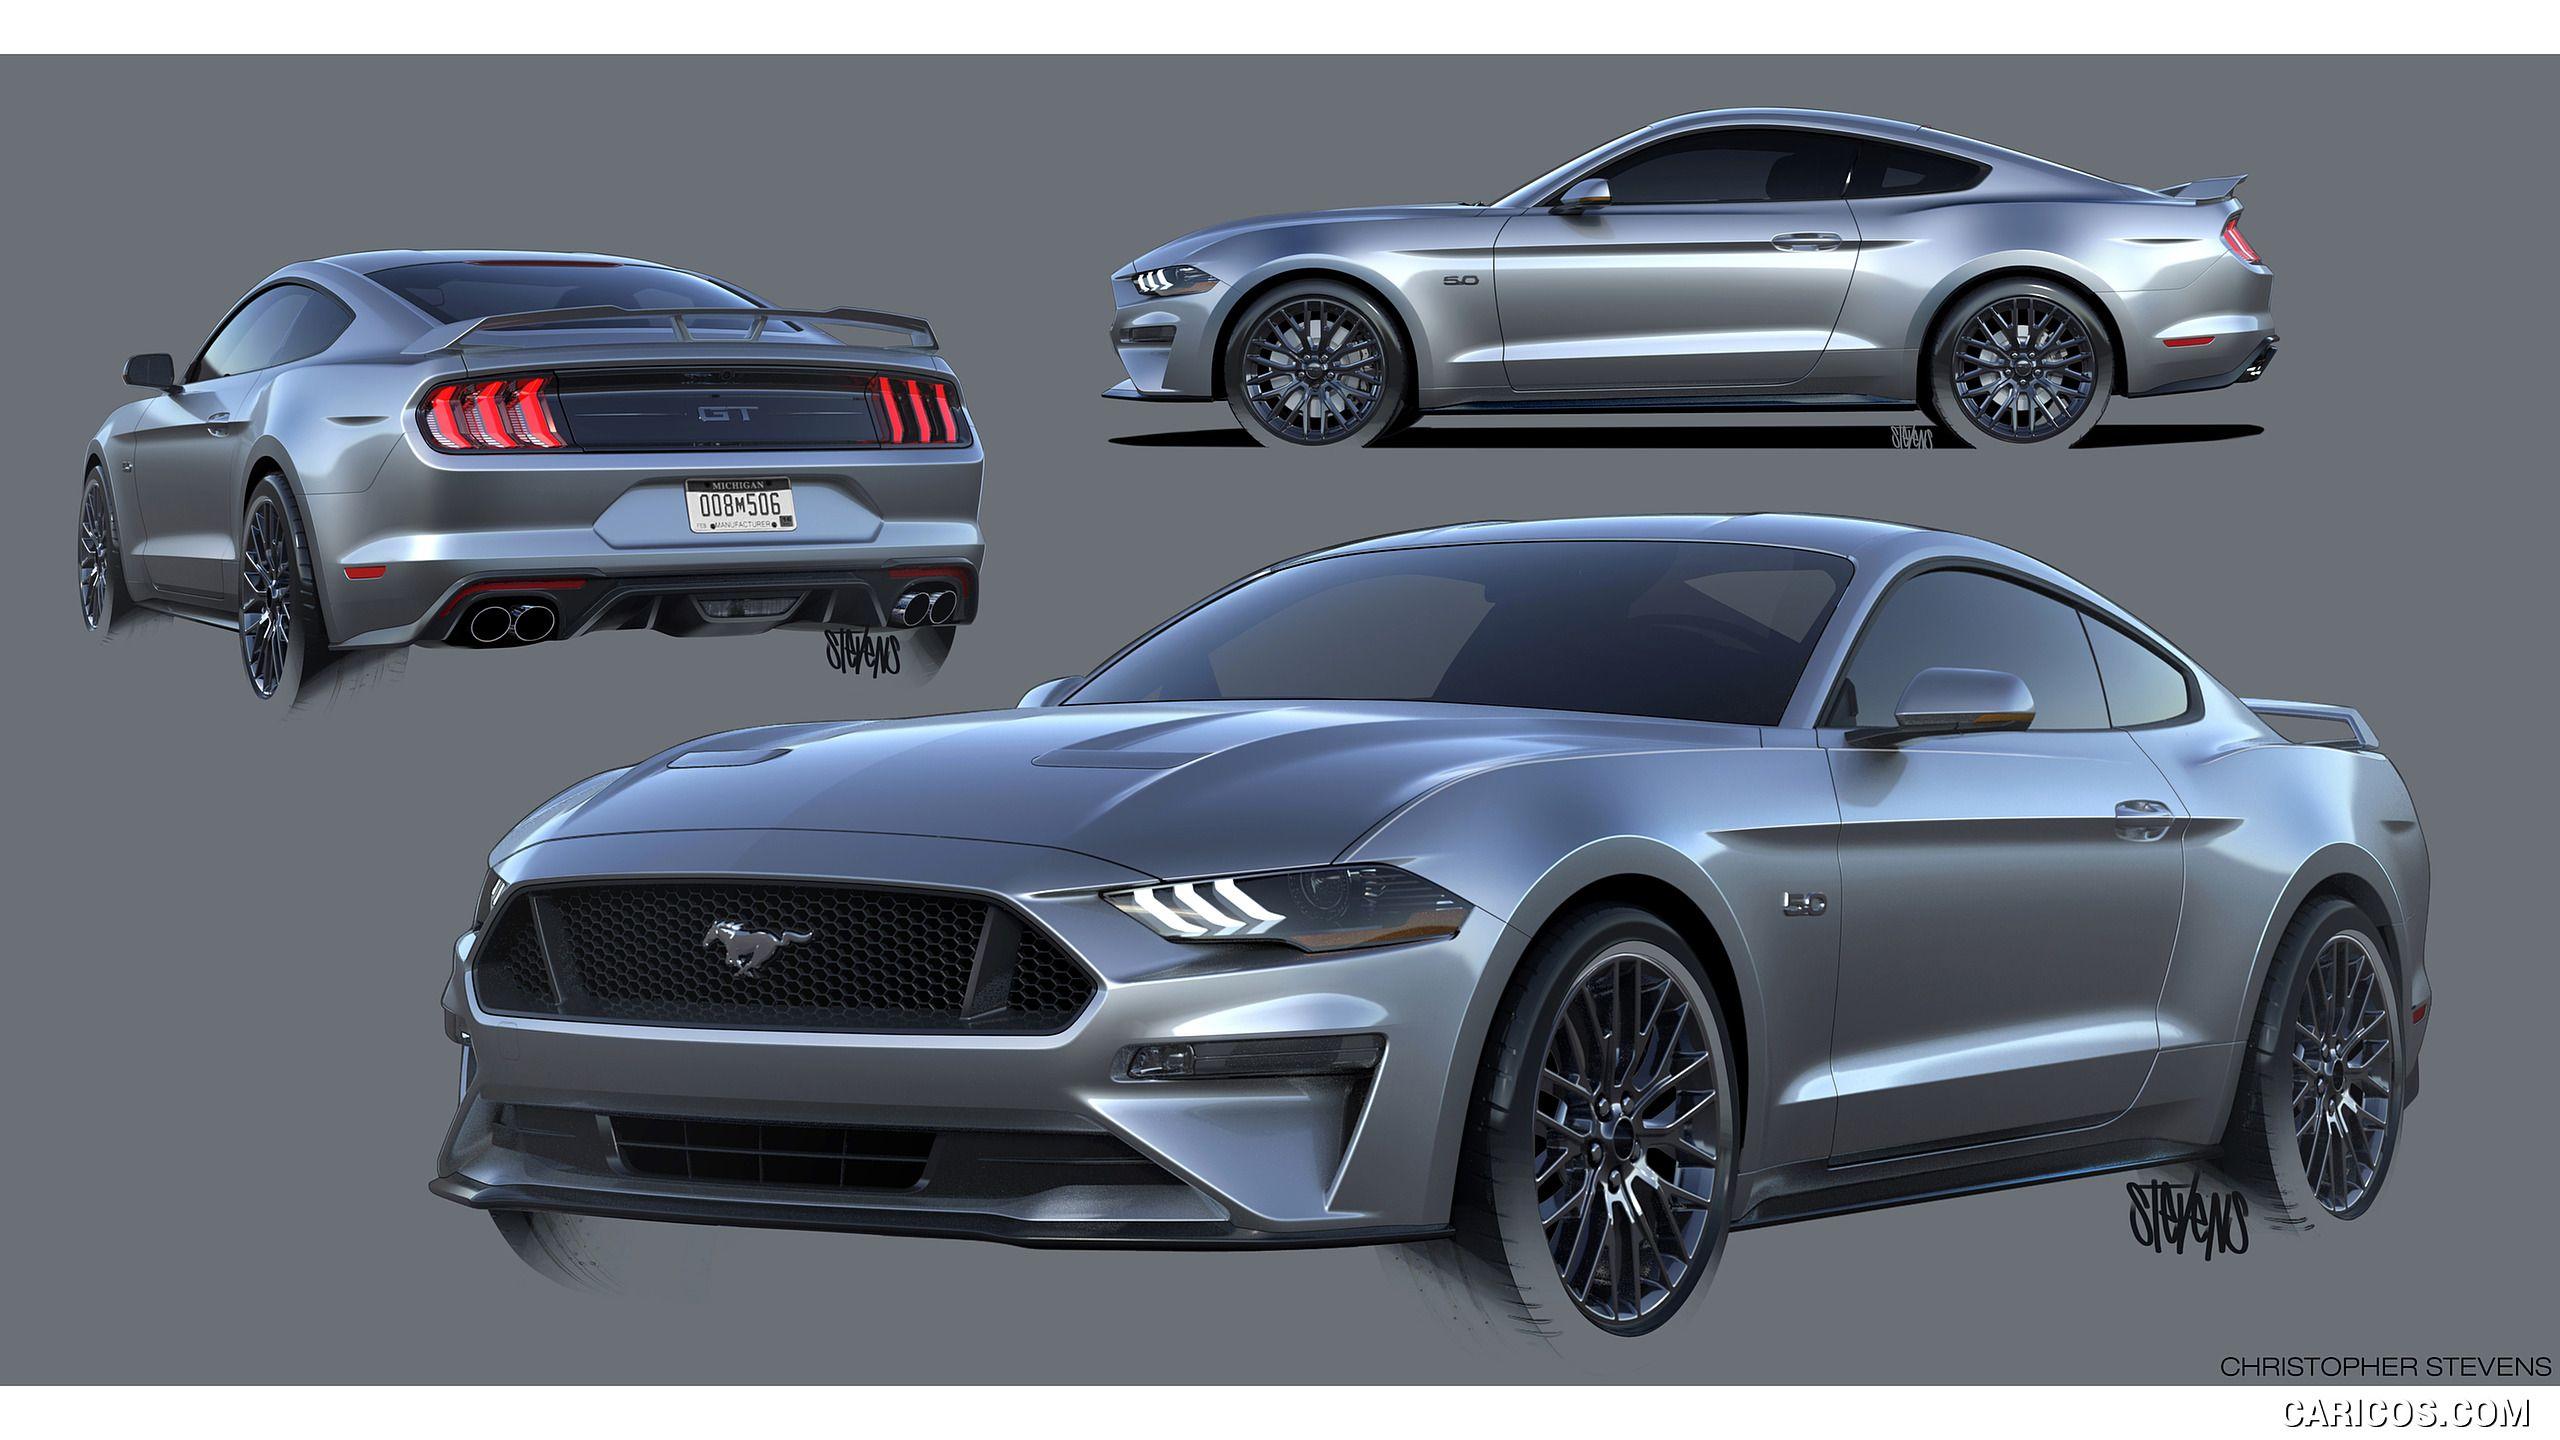 2018 Ford Mustang Wallpaper